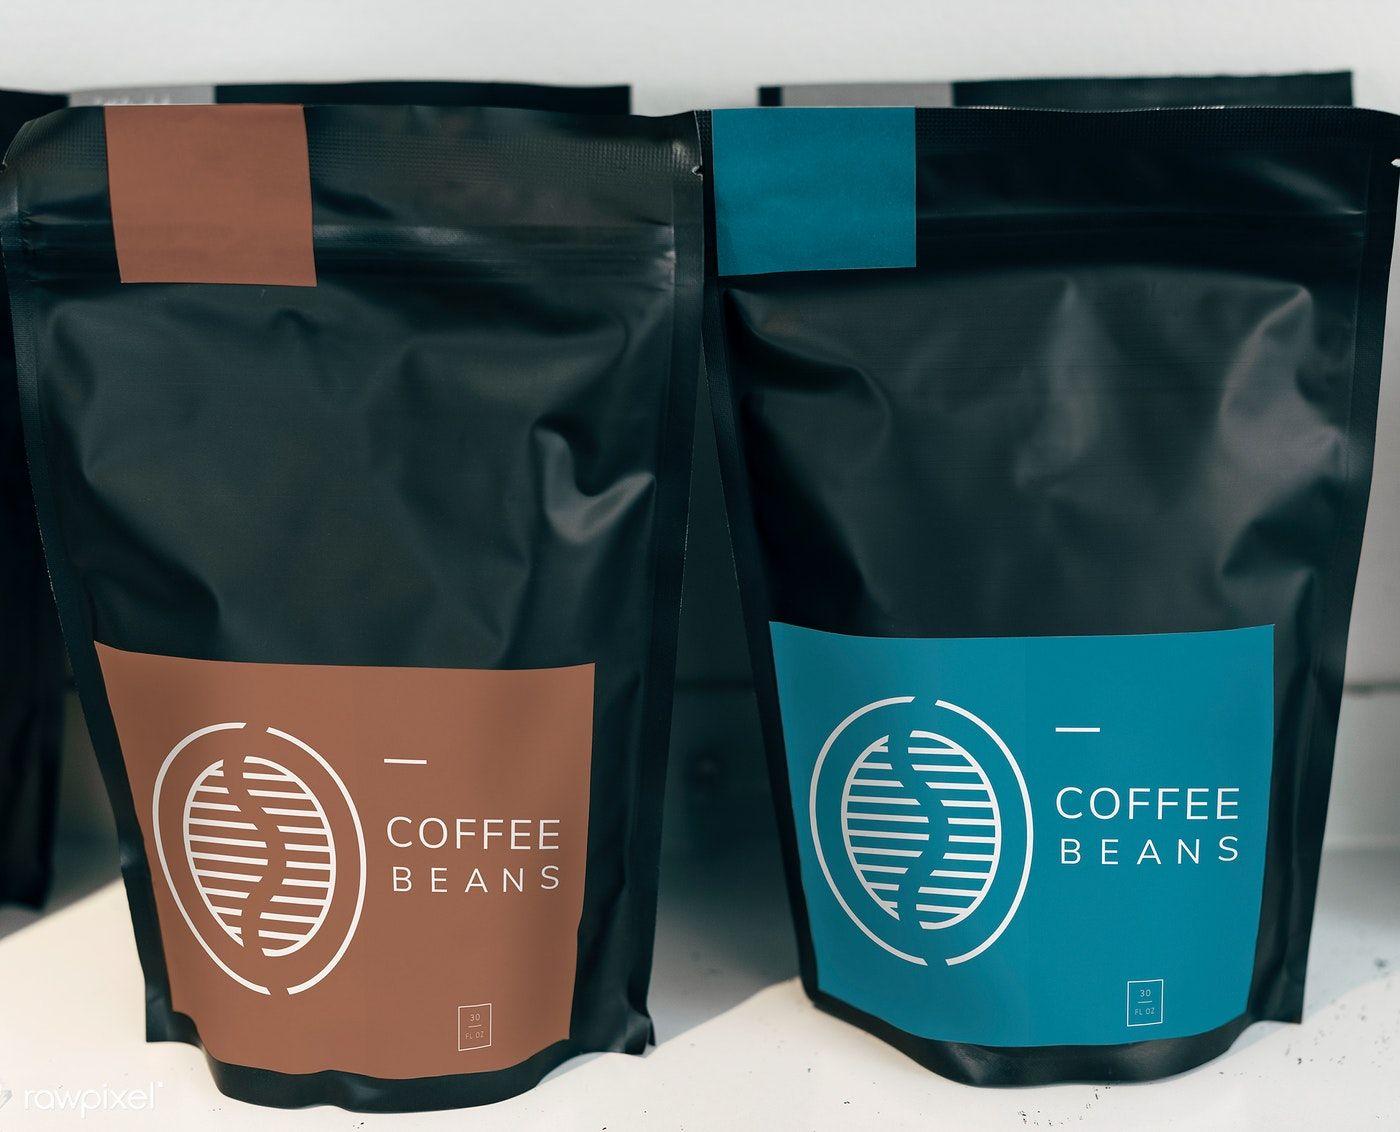 Coffee bean bag mockup design free image by